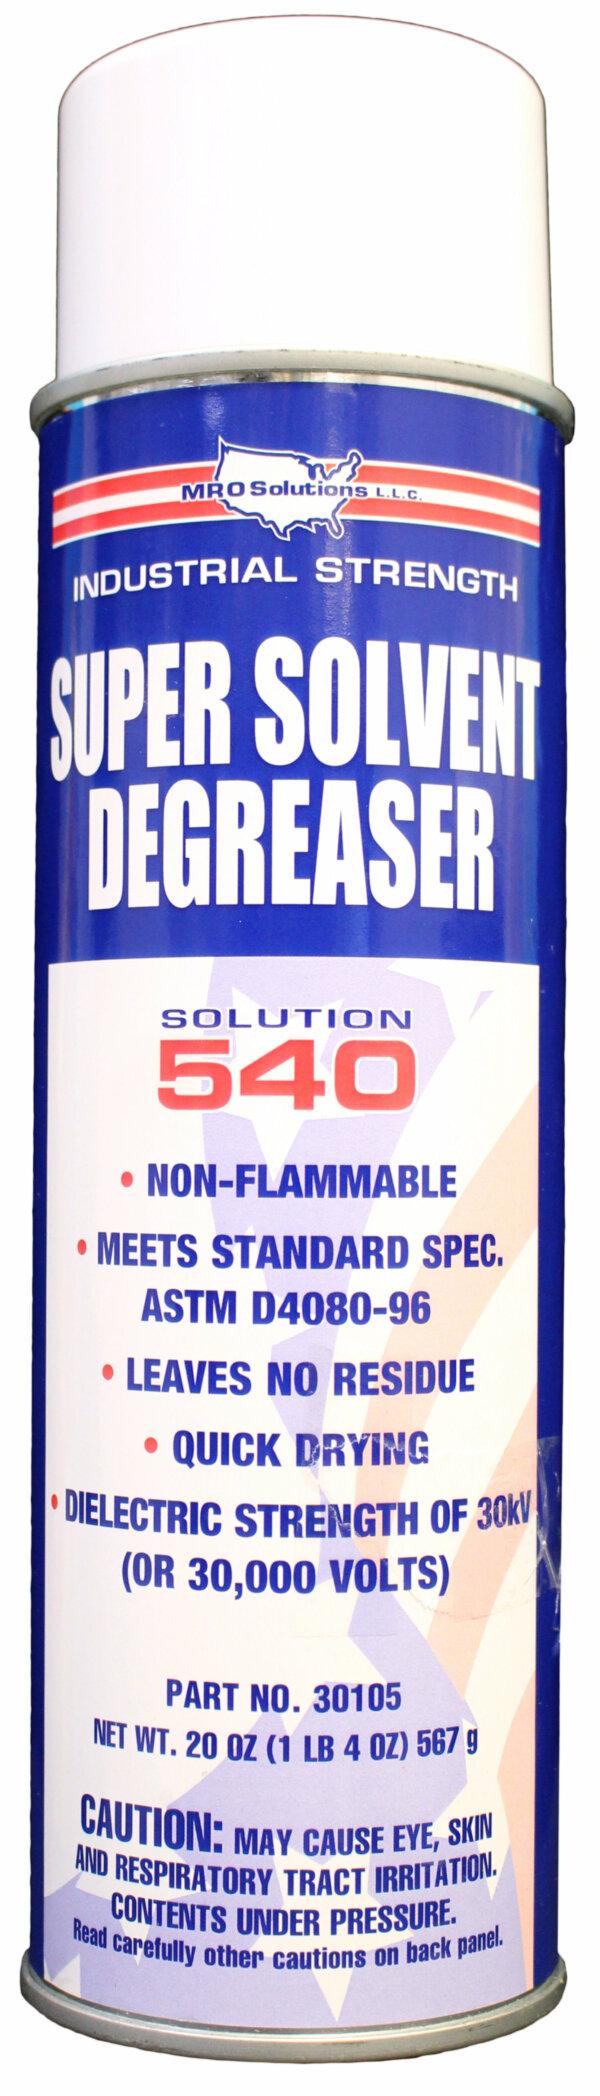 MRO Solution 540 – Super Solvent Degreaser (20 oz. Aerosol)